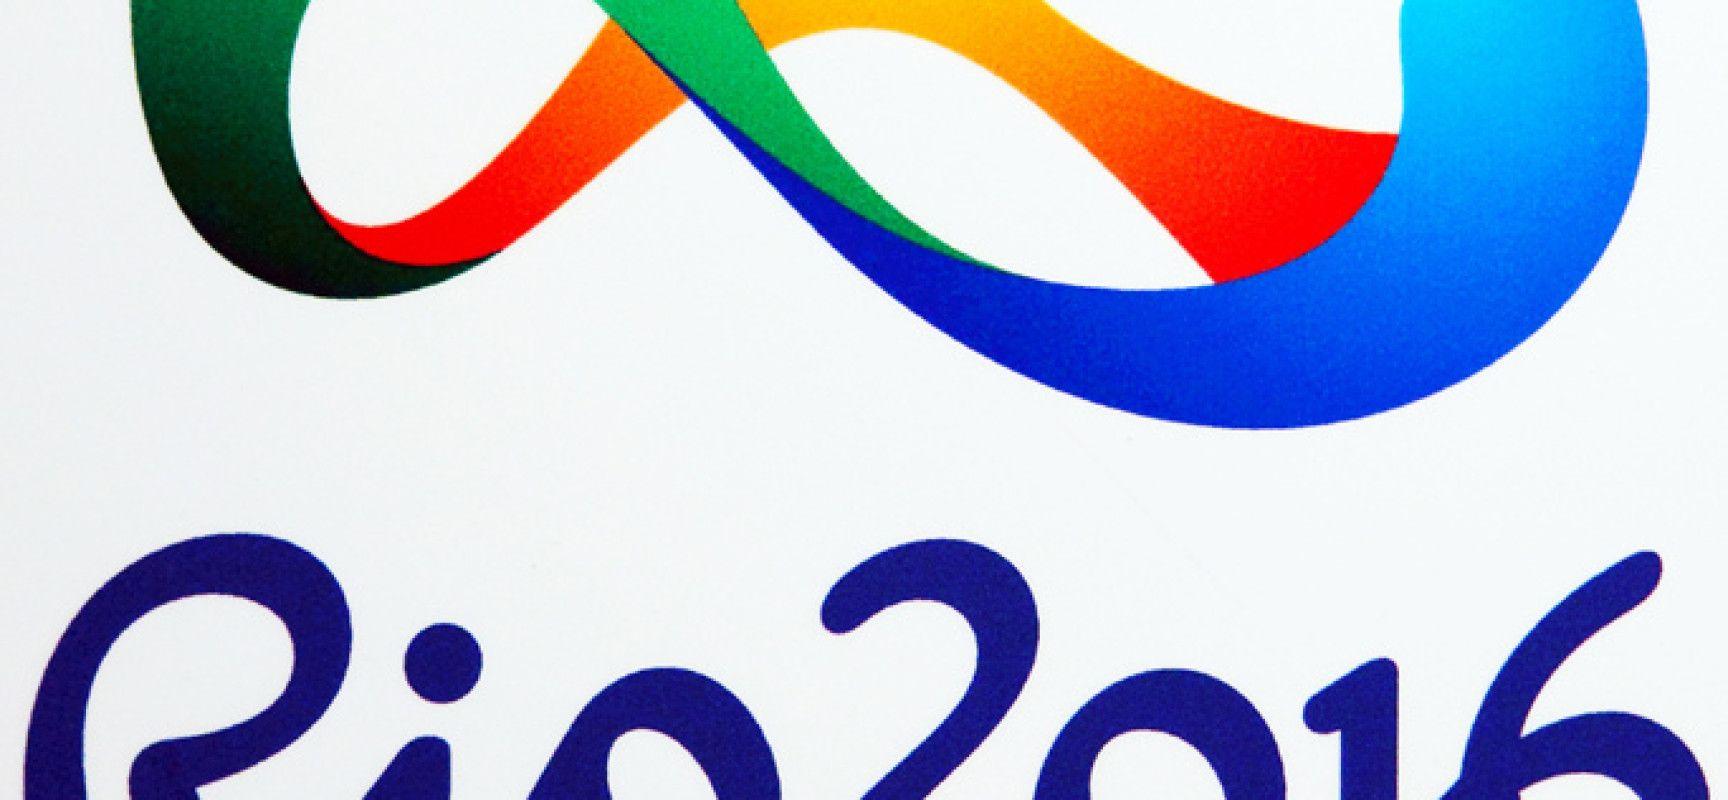 Olimpiadi 2016, vice console russo uccide criminale